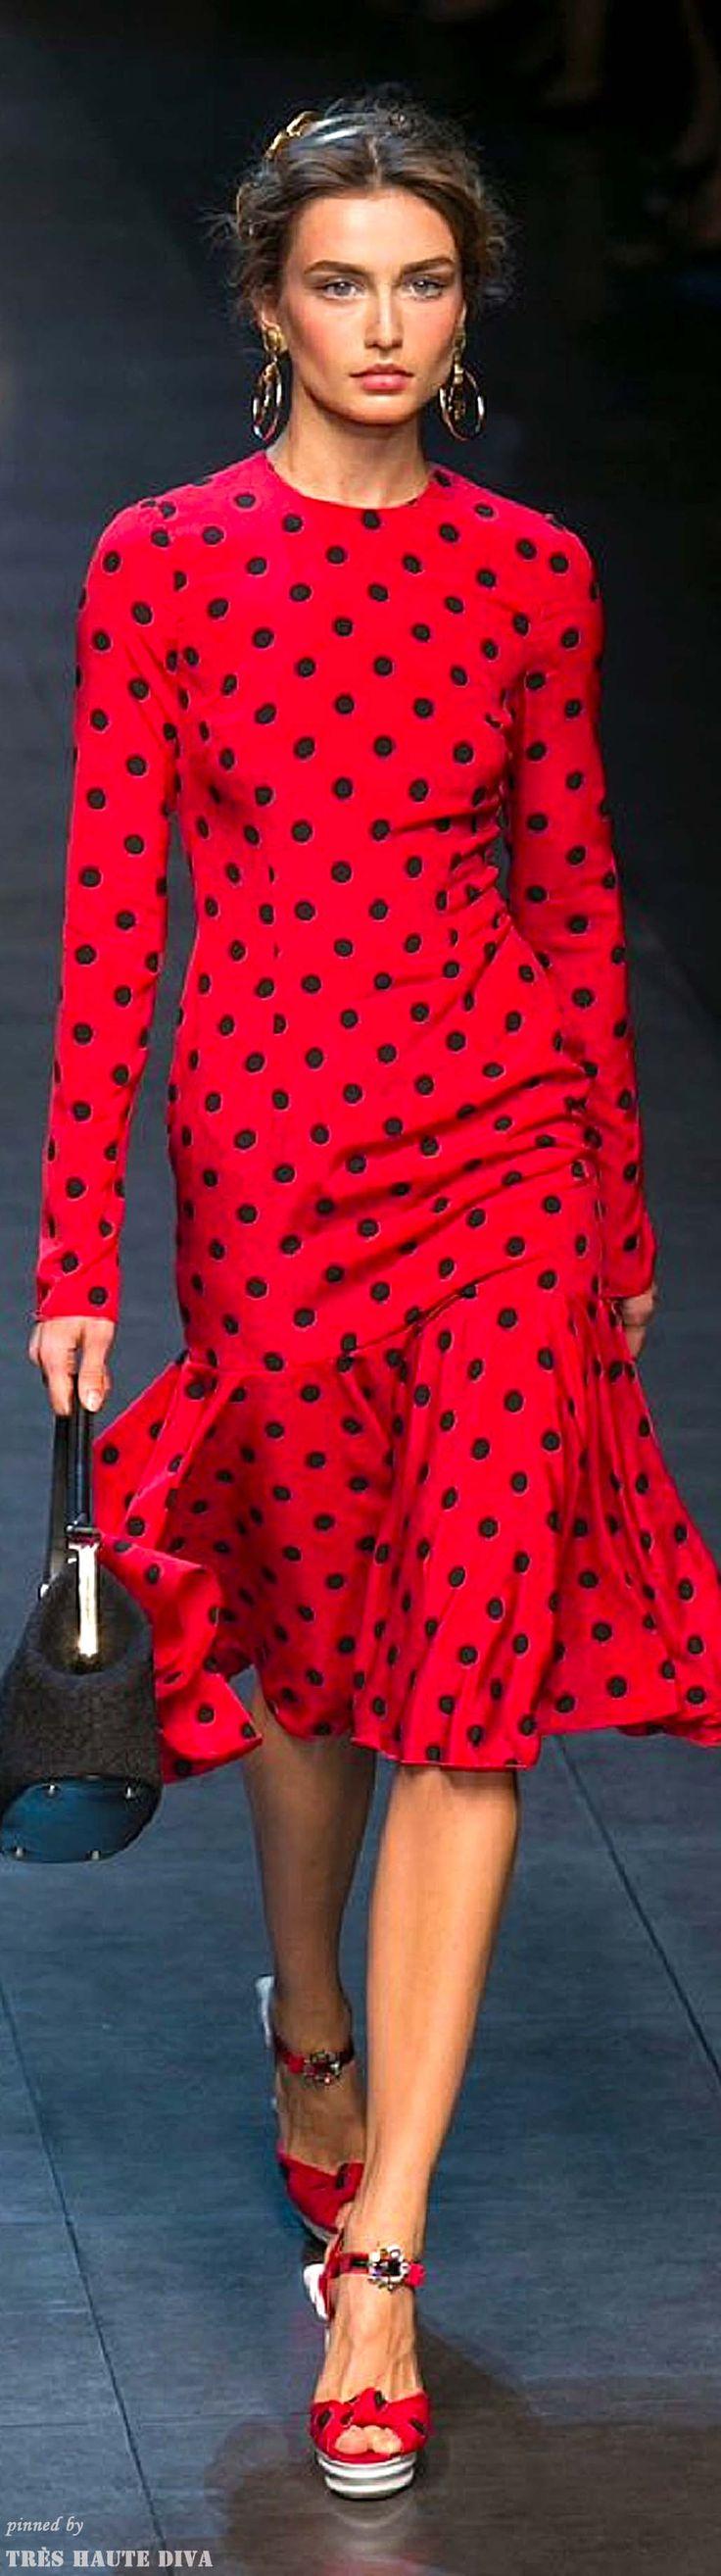 FashionChic   Rosamaria G Frangini    Dolce & Gabbana Spring 2014 RTW